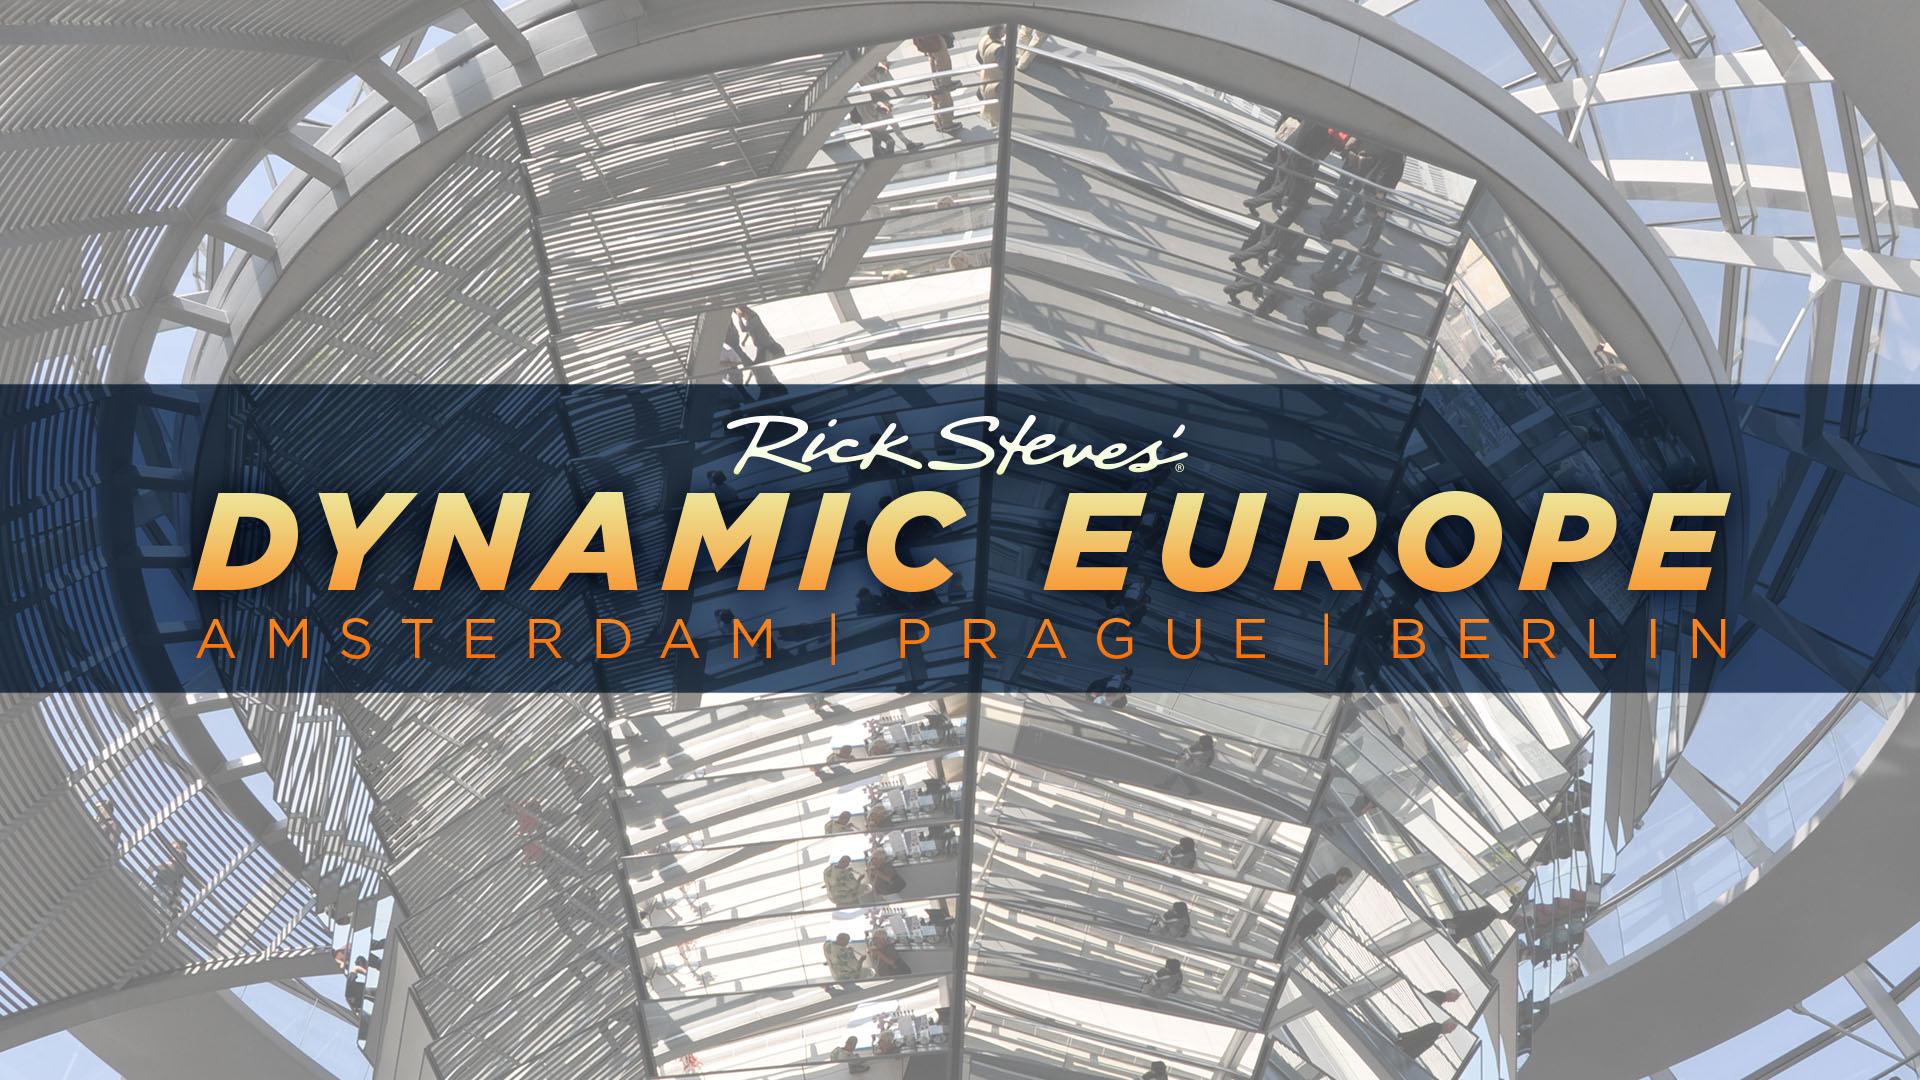 Rick Steves' Dynamic Europe: Amsterdam, Prague, Berlin